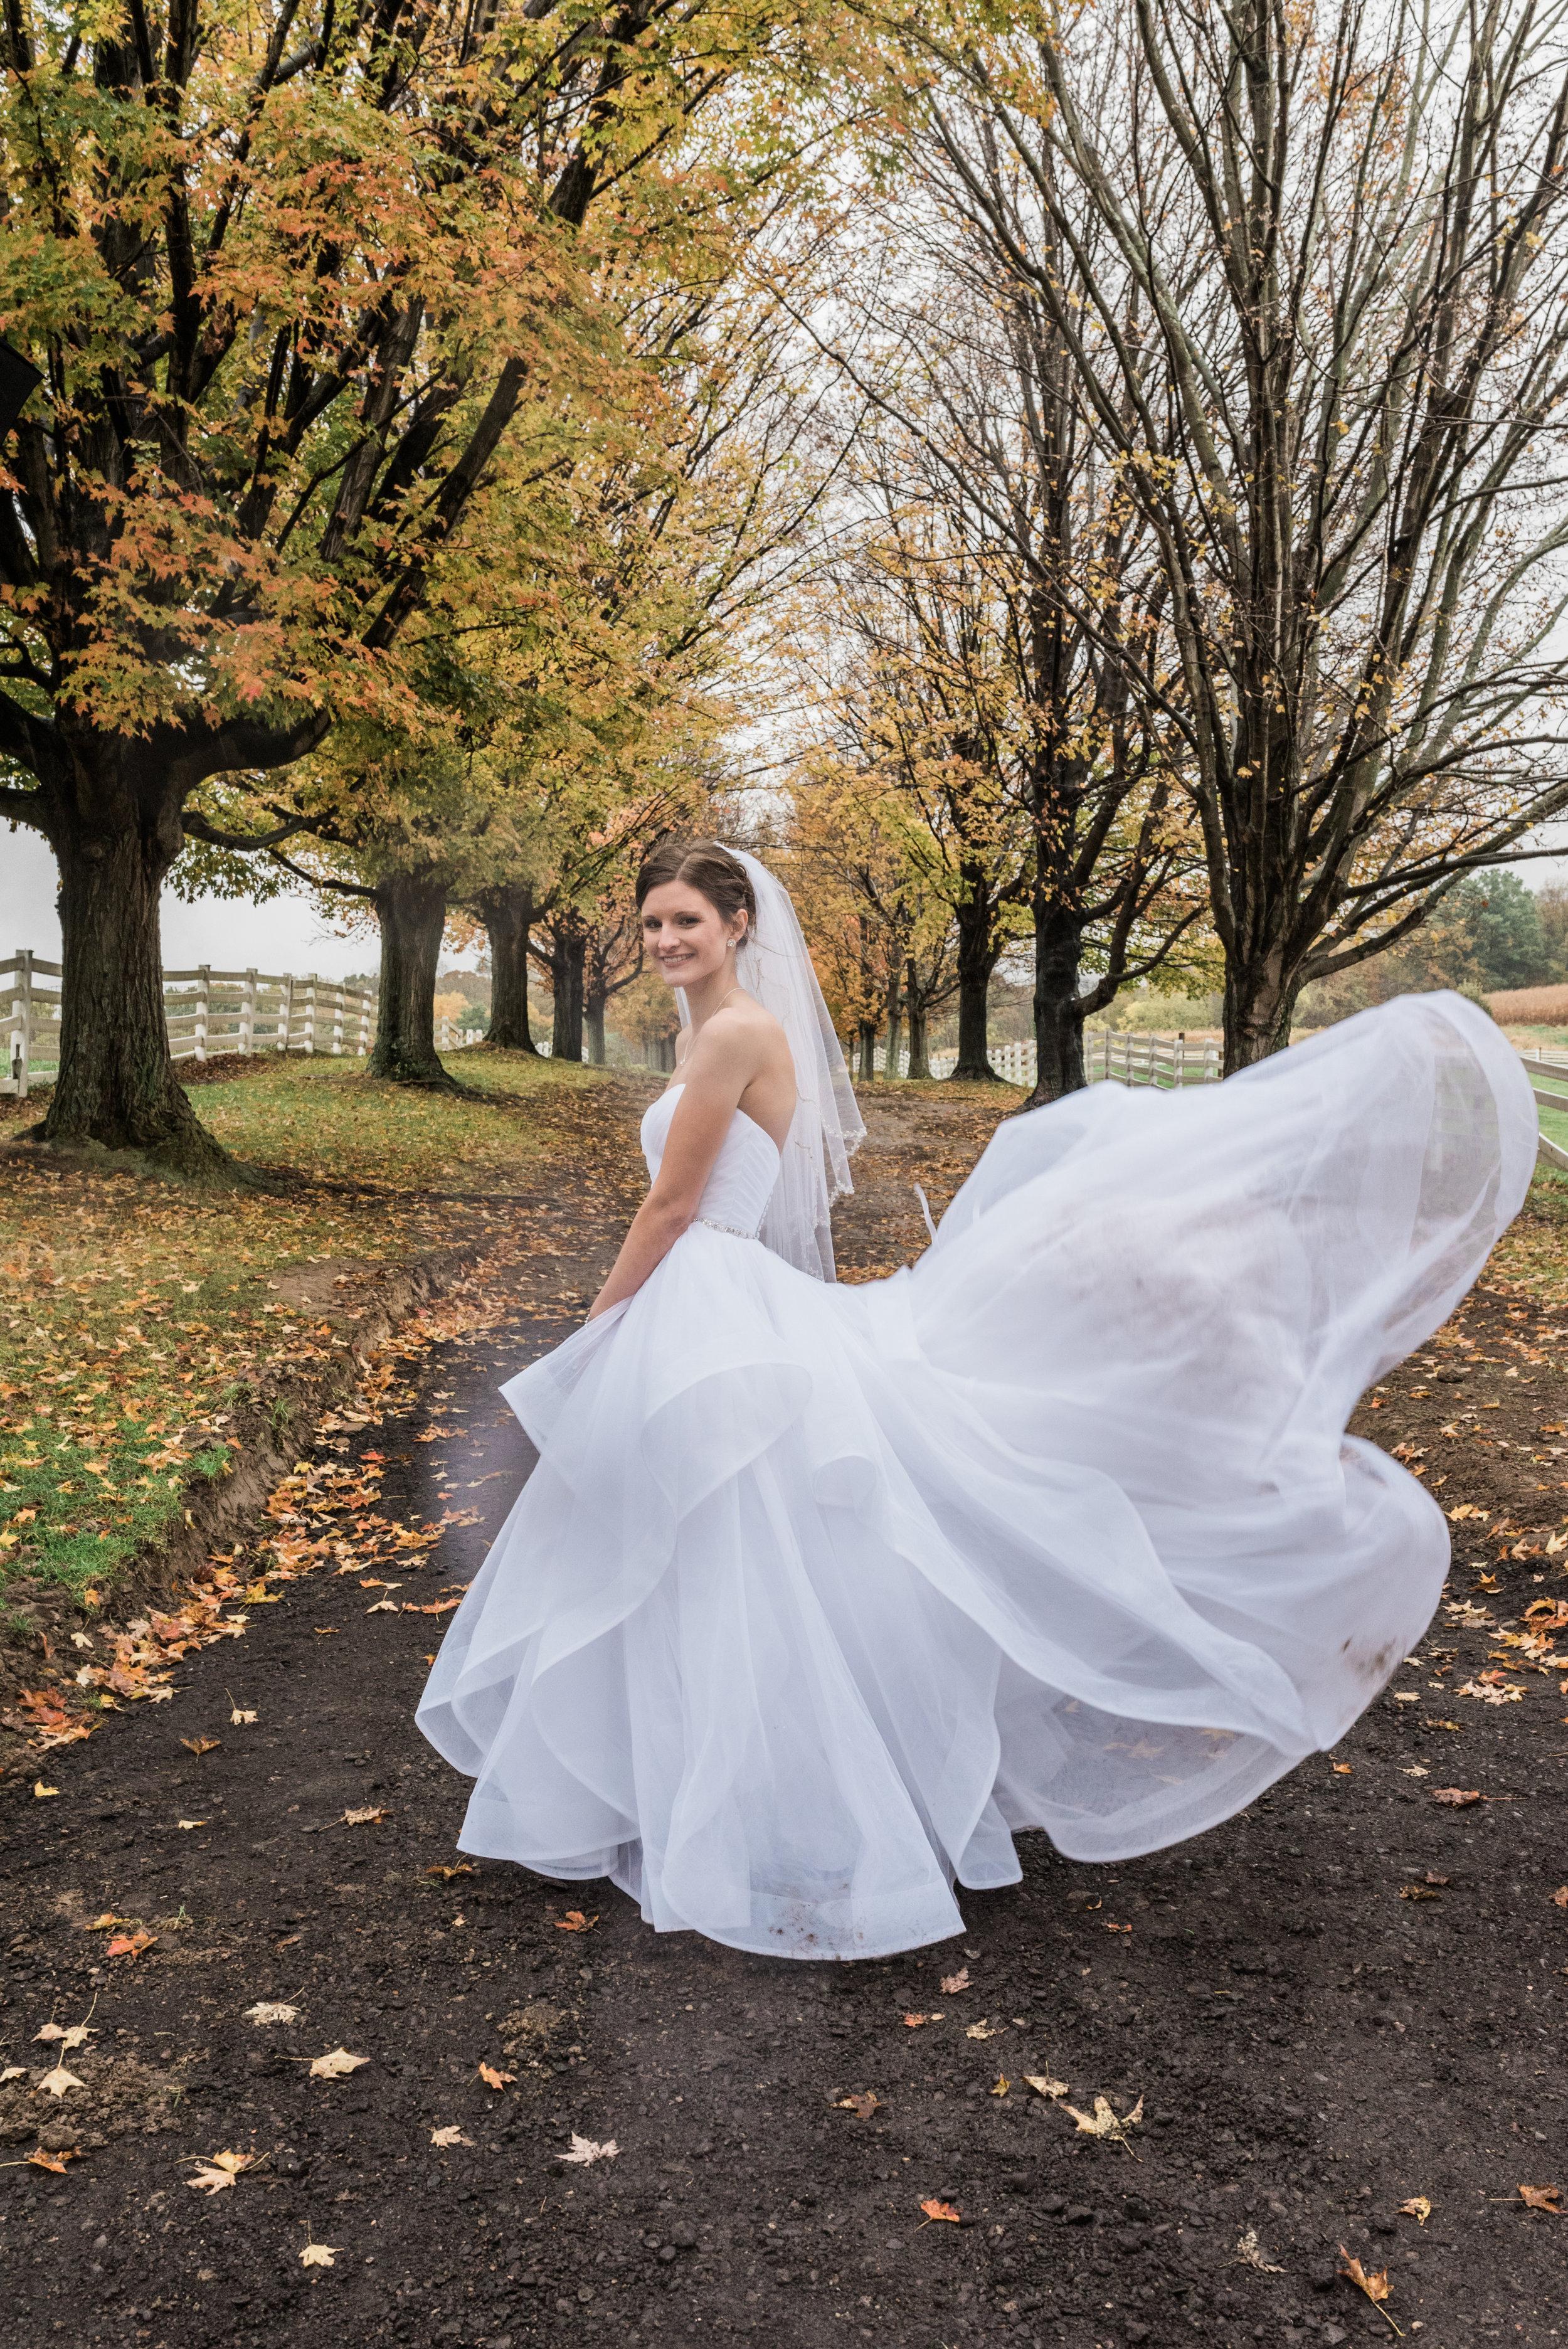 kasprackwedding-2065.jpg